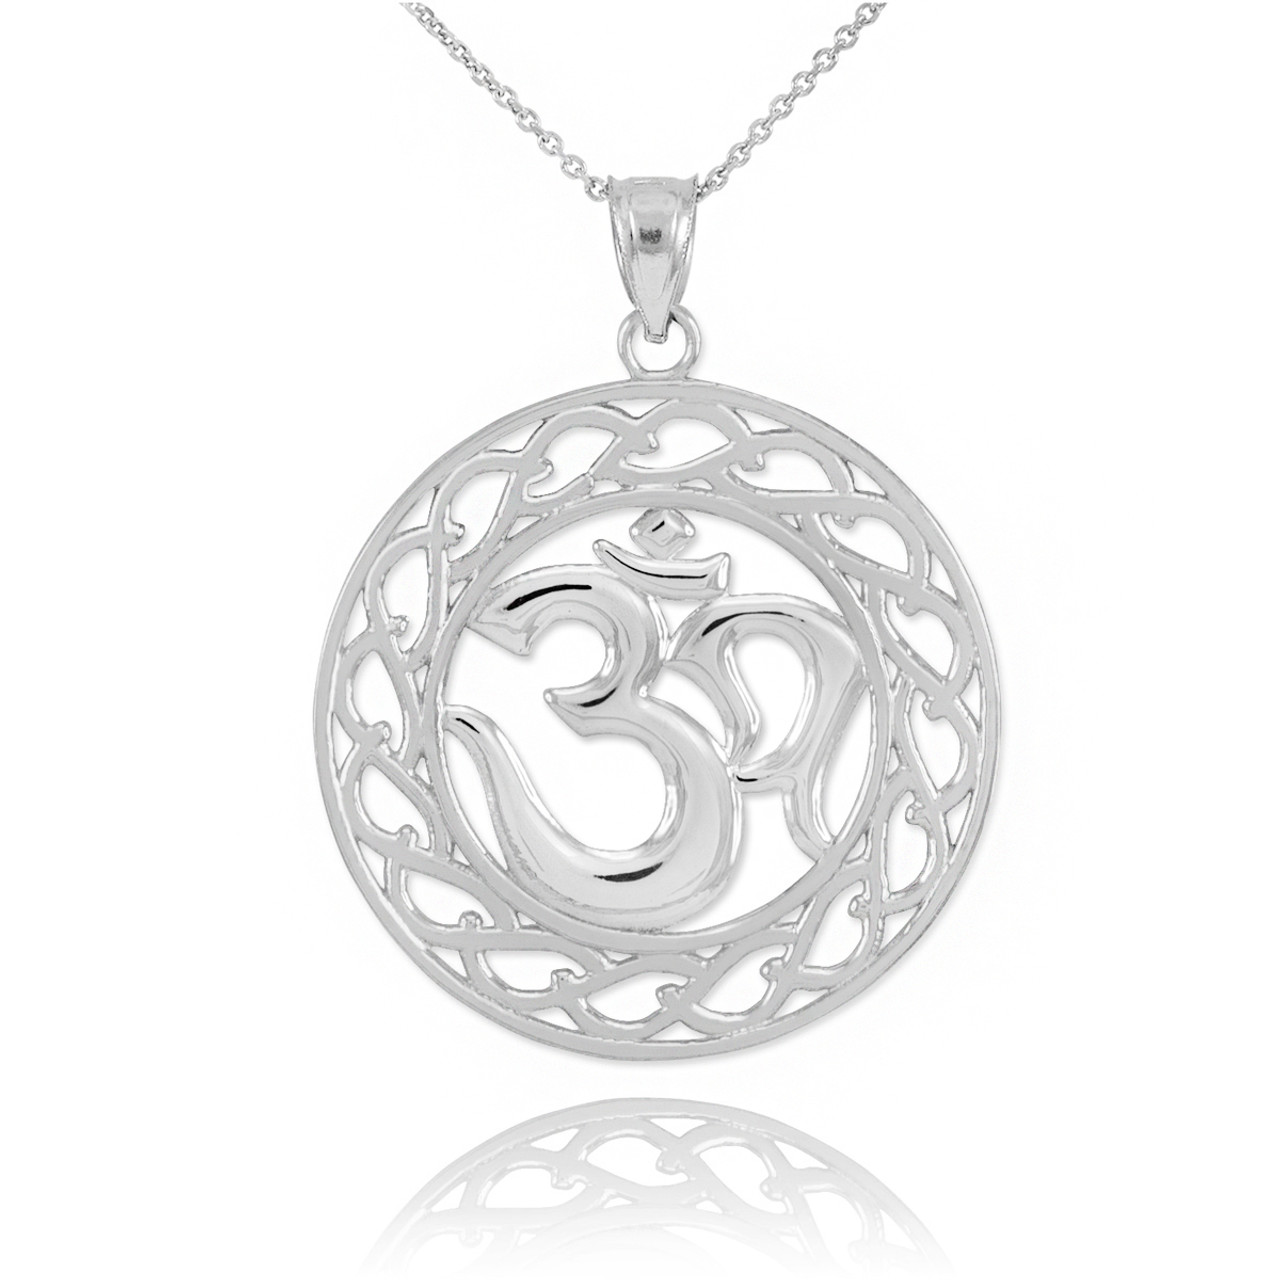 Sterling silver om symbol pendant necklace om pendants sterling silver om symbol pendant necklace aloadofball Gallery